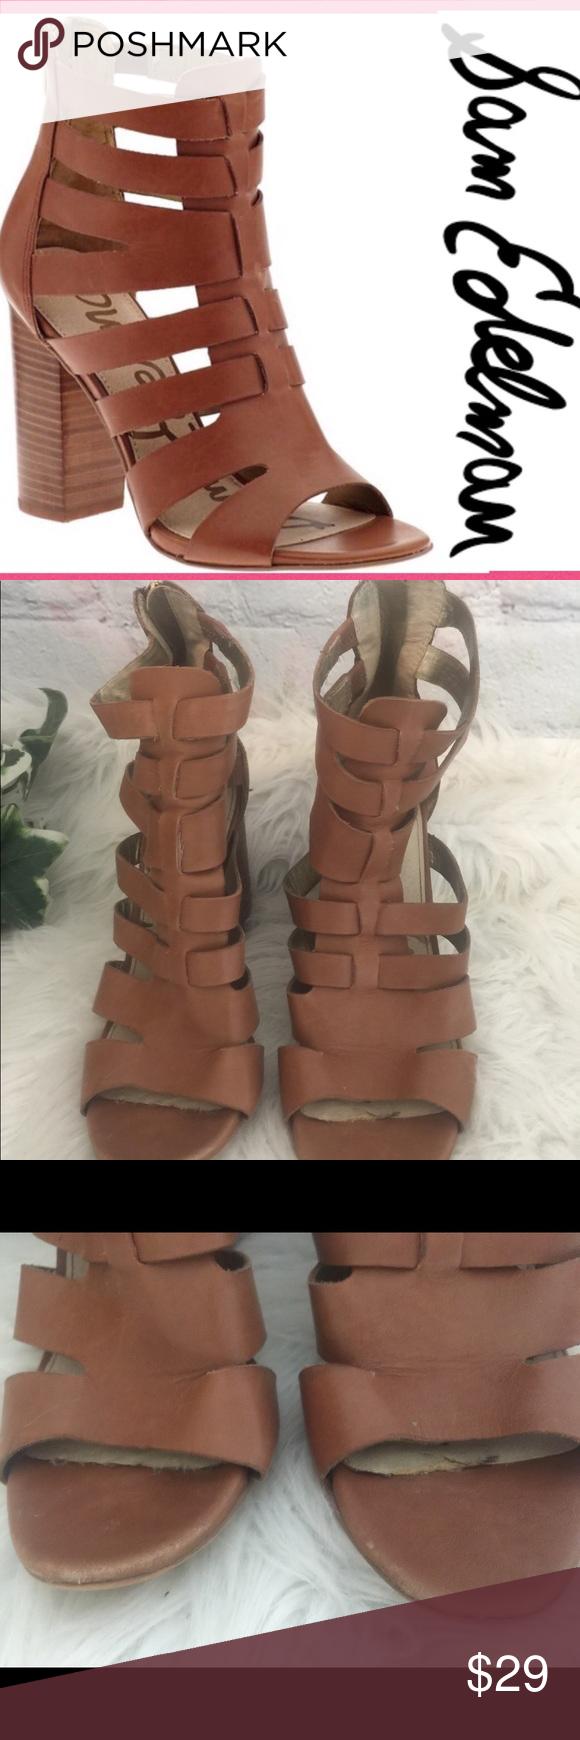 584243431a3cc 💥Sam Edelman Leather Gladiator Sandals💥8 1 2 Sam Edelman Yazmine  Gladiator Sandals